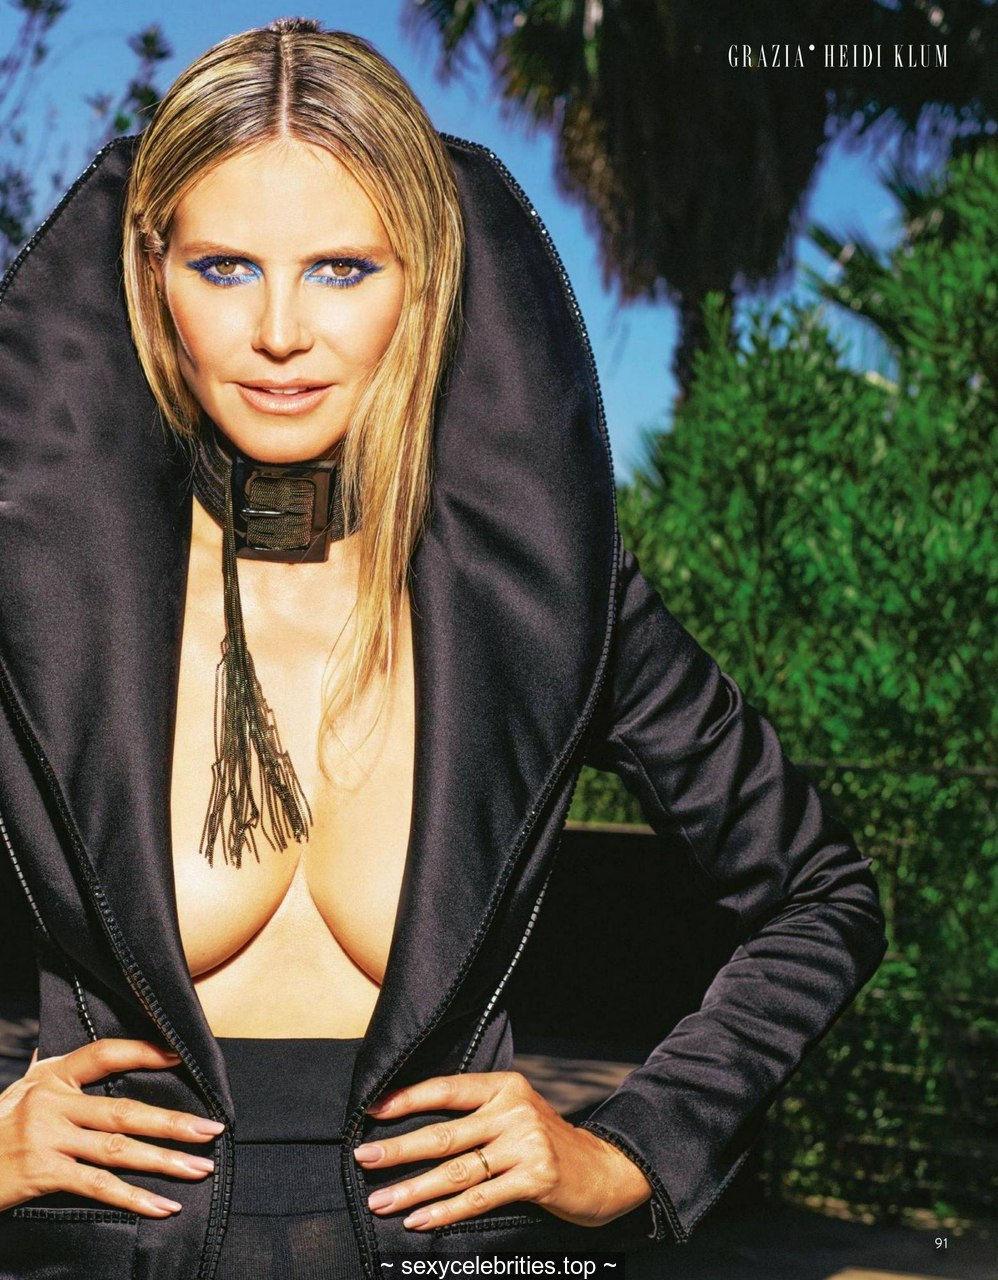 Heidi Klum sexy for Grazia magazine, Italia